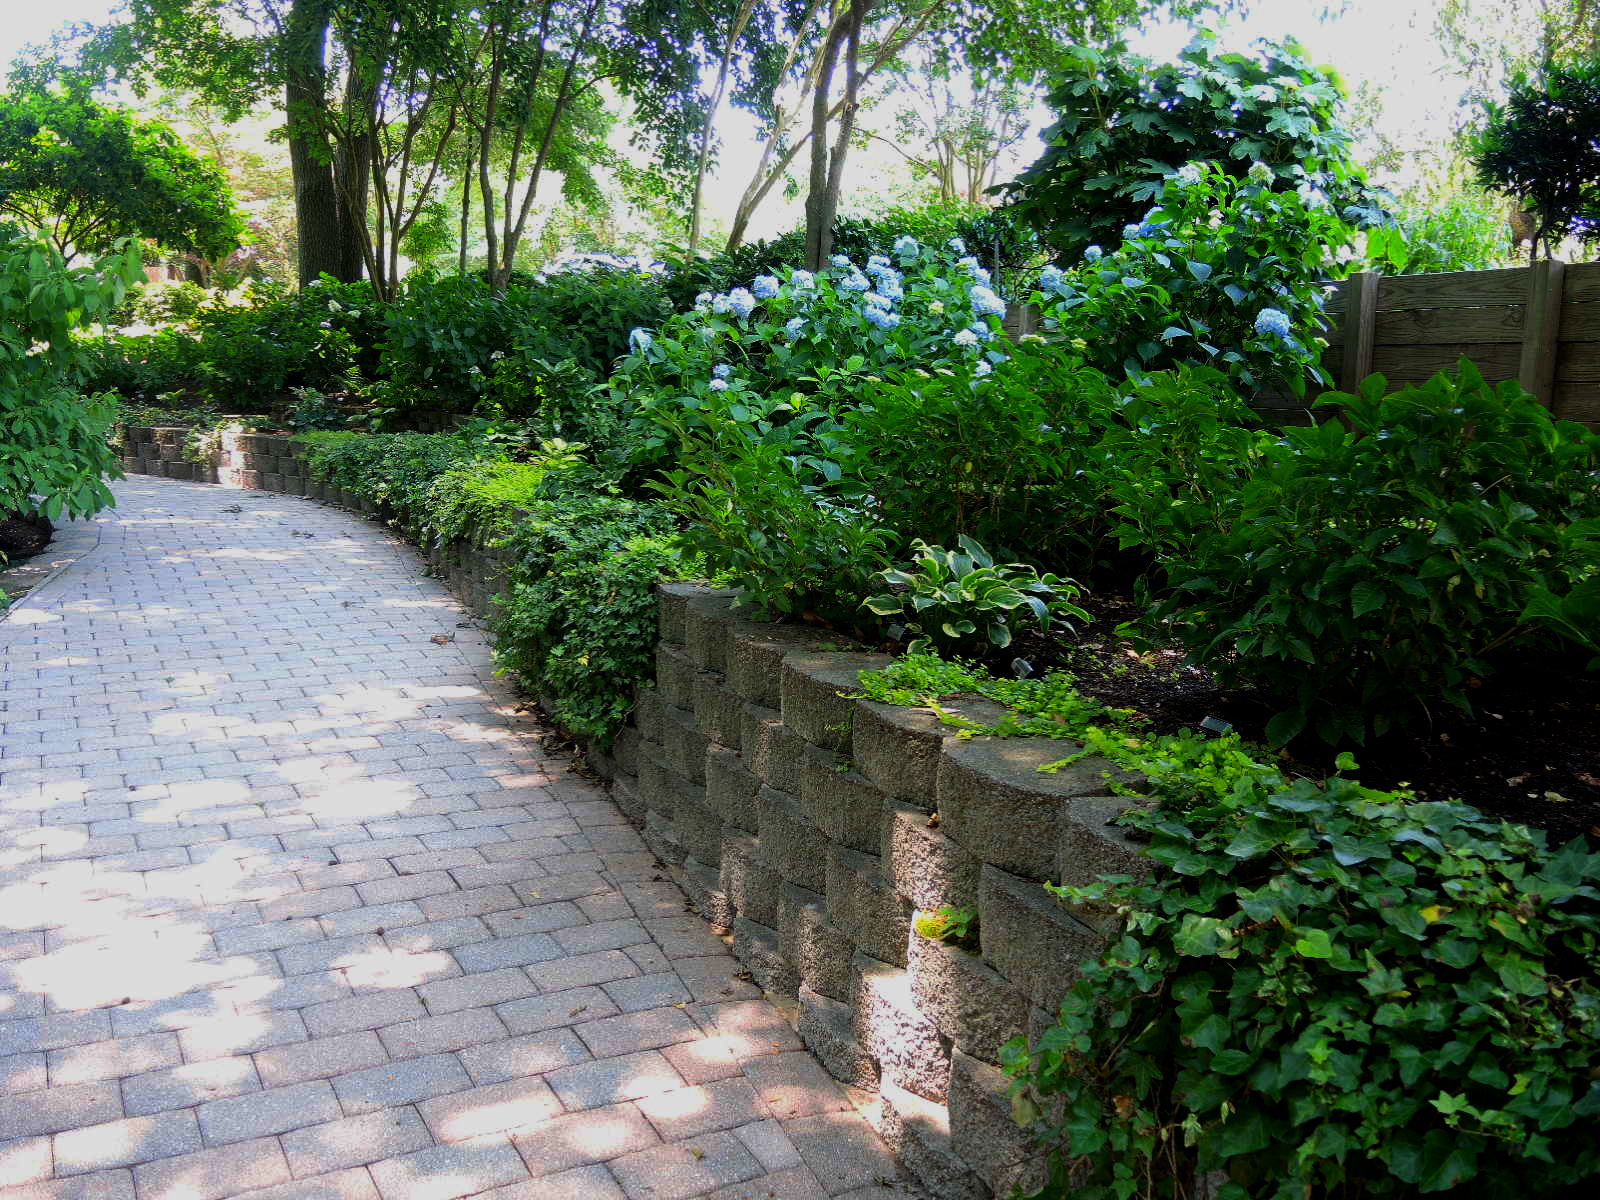 DSCN9955_-_garden_walkway[1].jpg